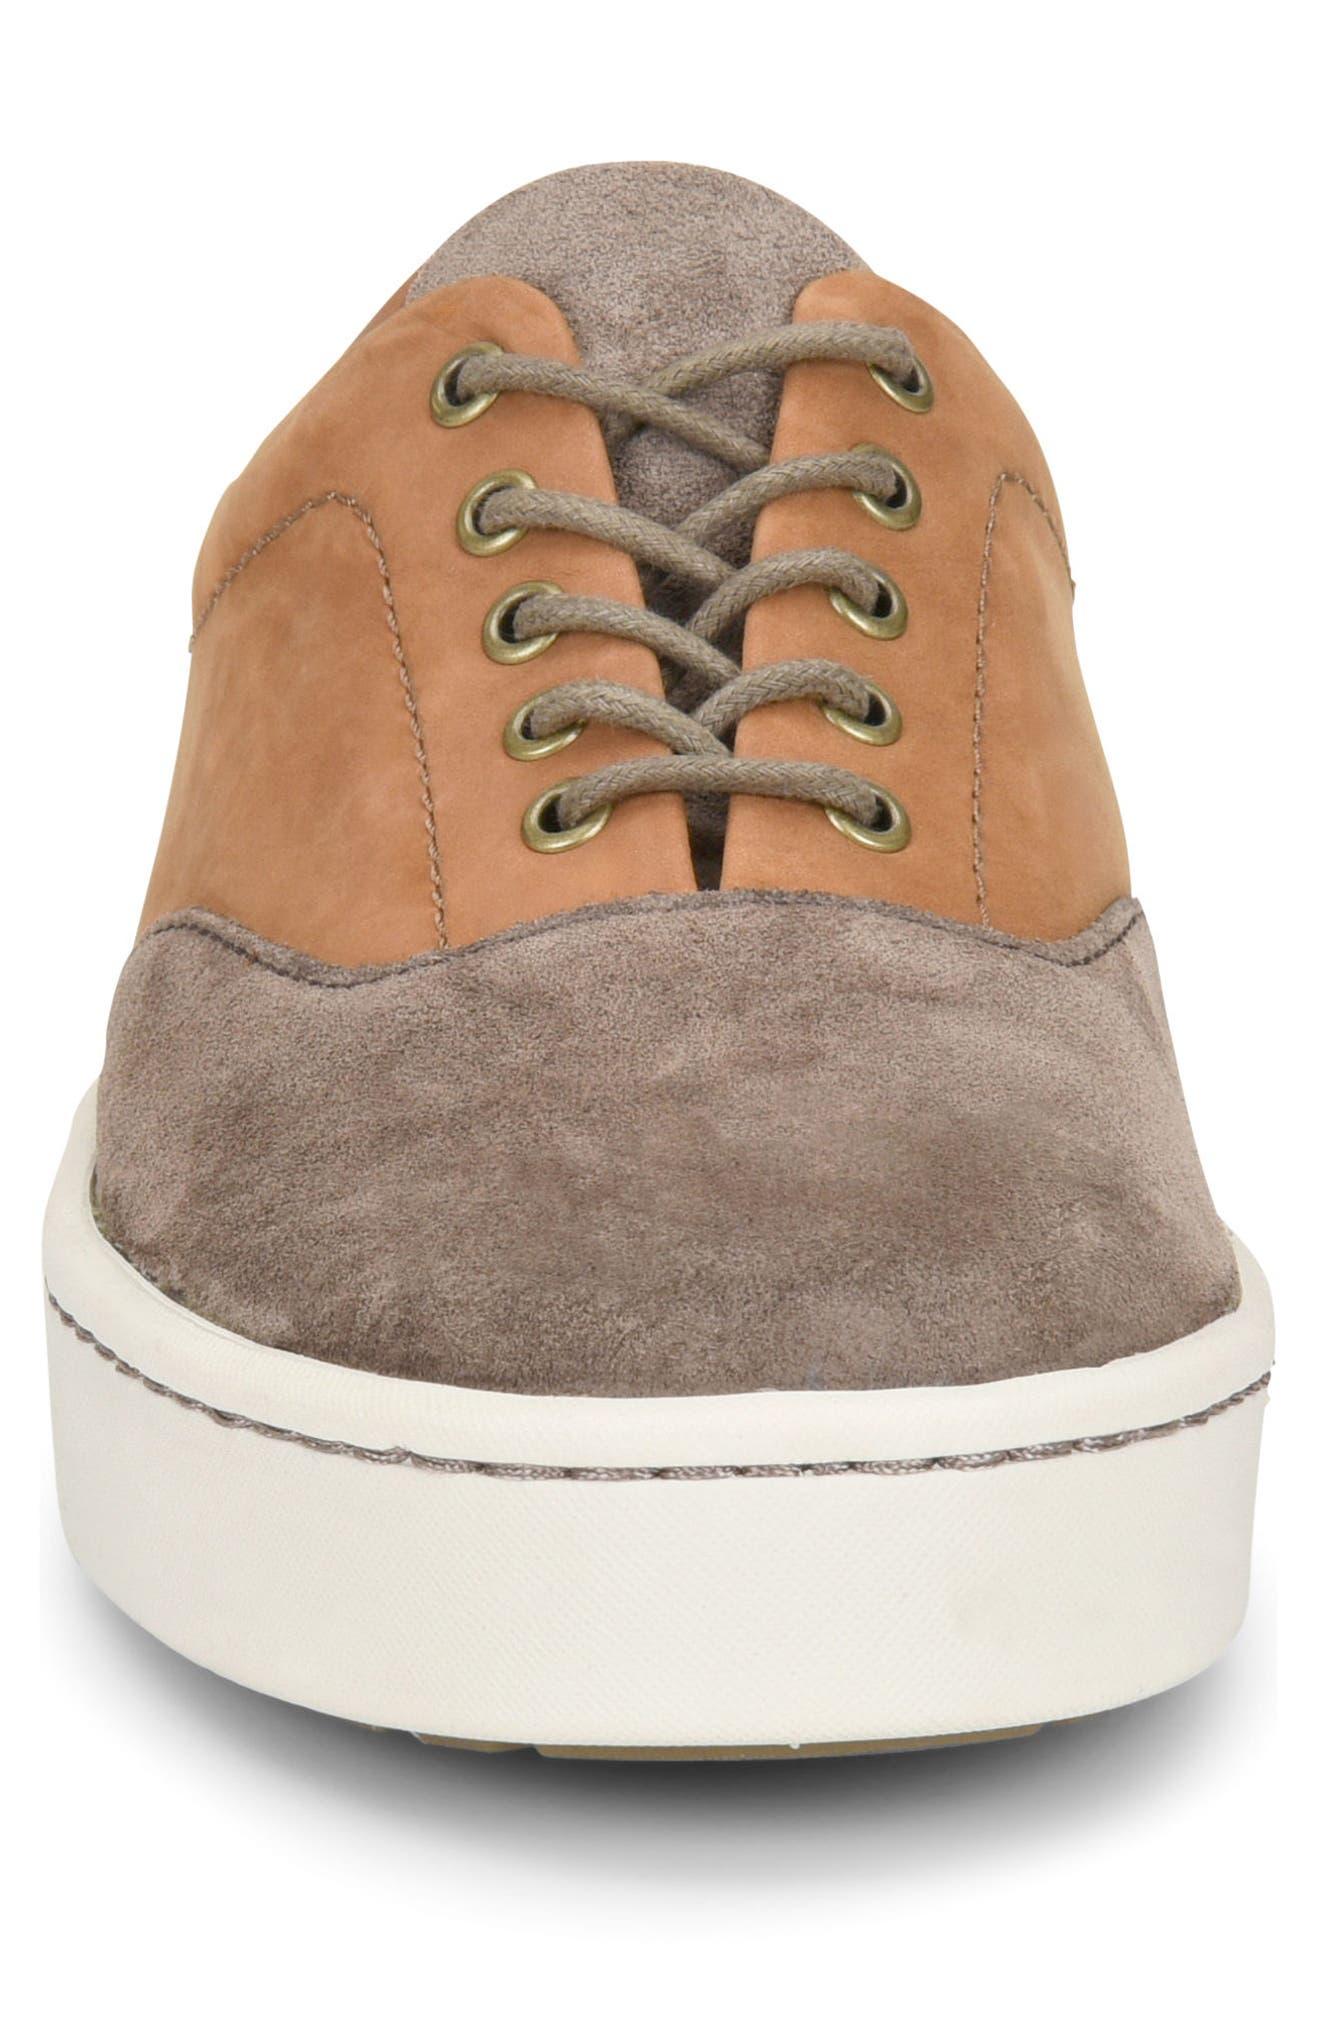 Keystone Low Top Sneaker,                             Alternate thumbnail 11, color,